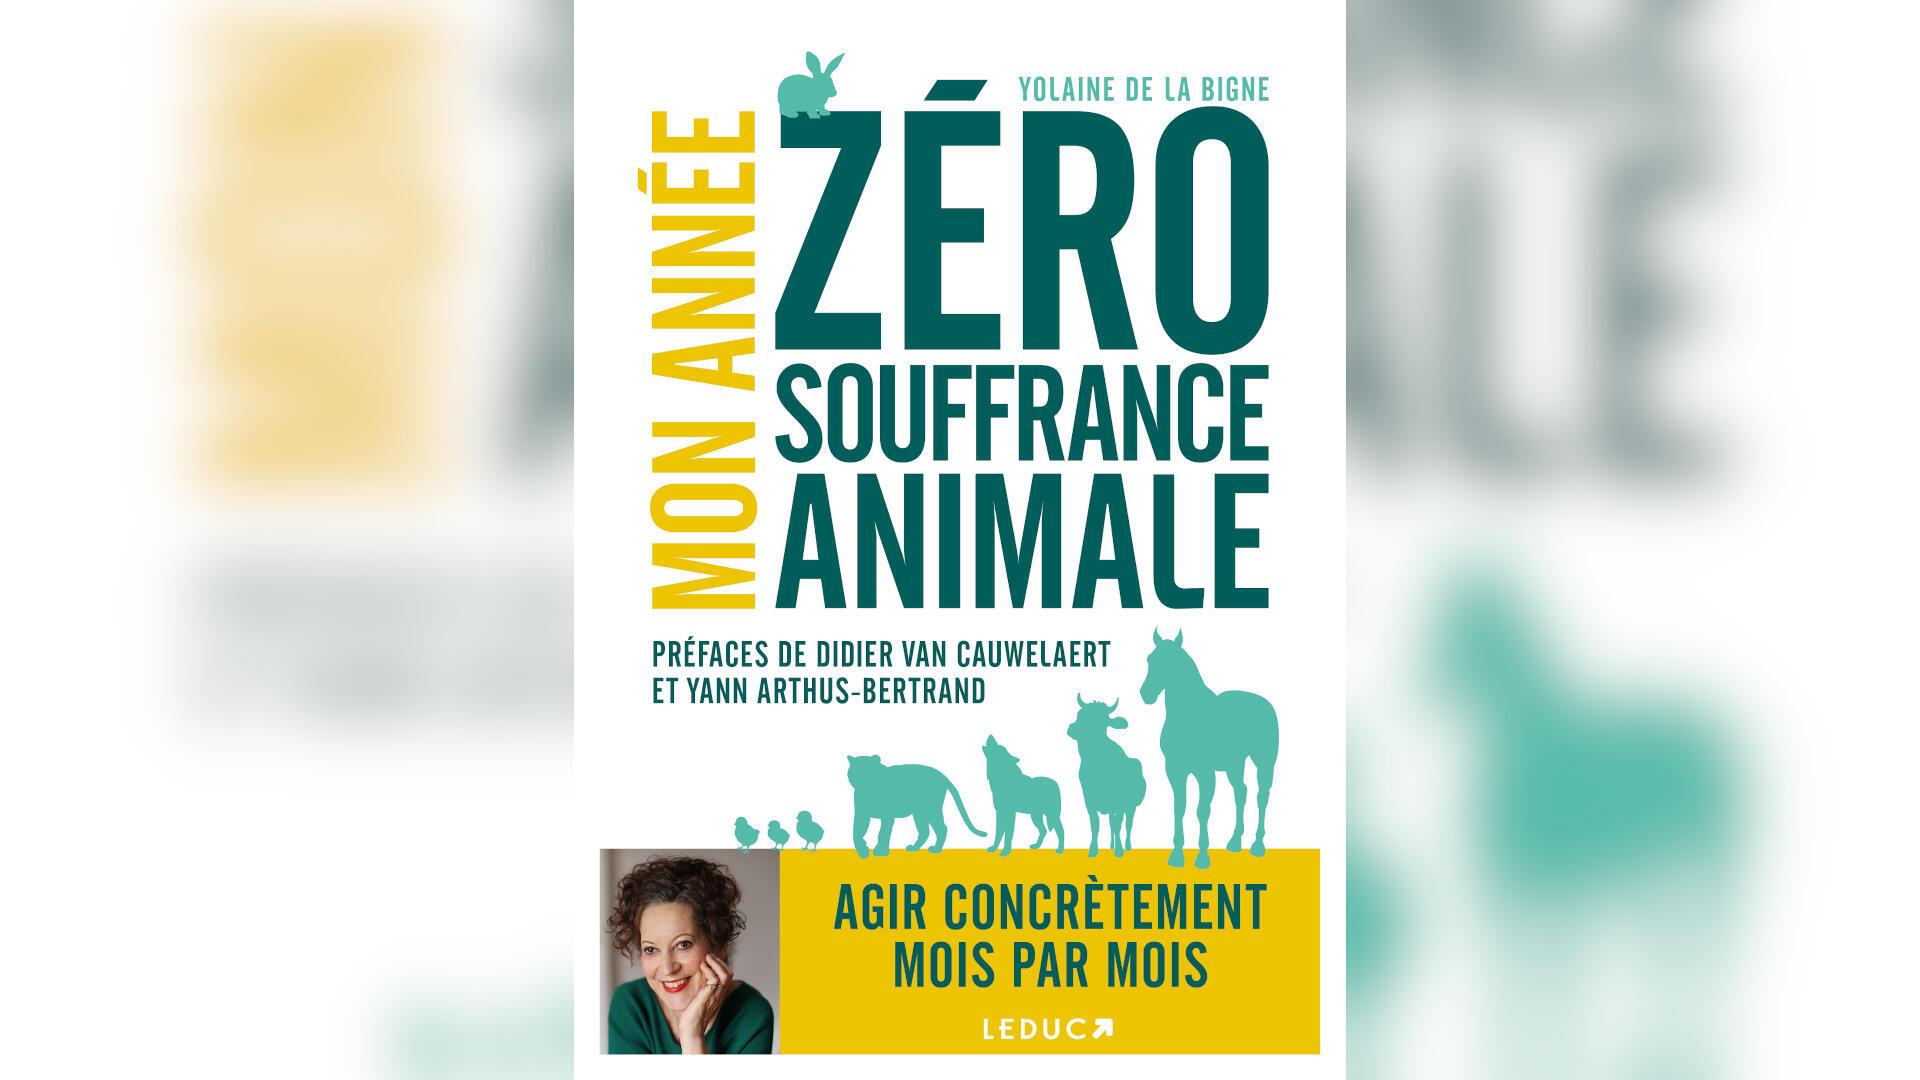 mon-annee-zero-souffrance-animale-yolaine-bigne-2021